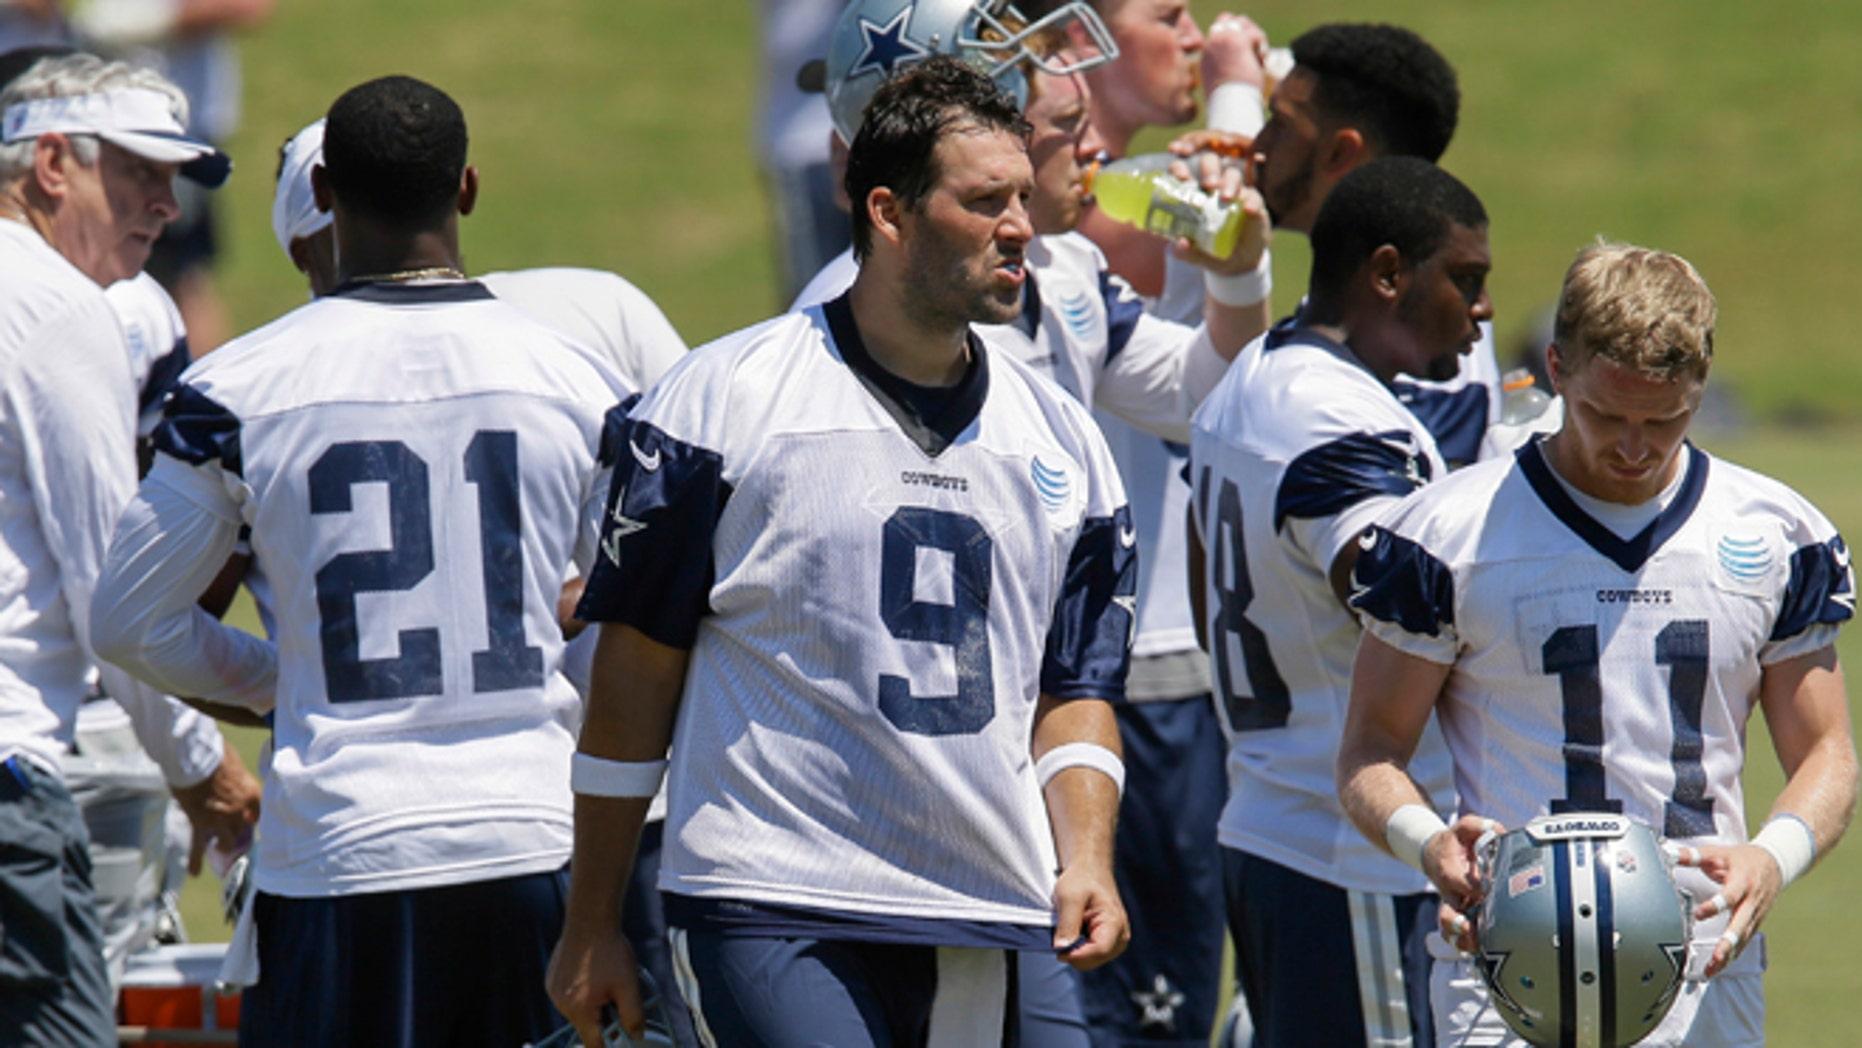 Dallas Cowboys quarterback Tony Romo (9) takes a break during an NFL football organized activity, Wednesday, June 10, 2015, in Irving, Texas. (AP Photo/Tim Sharp)